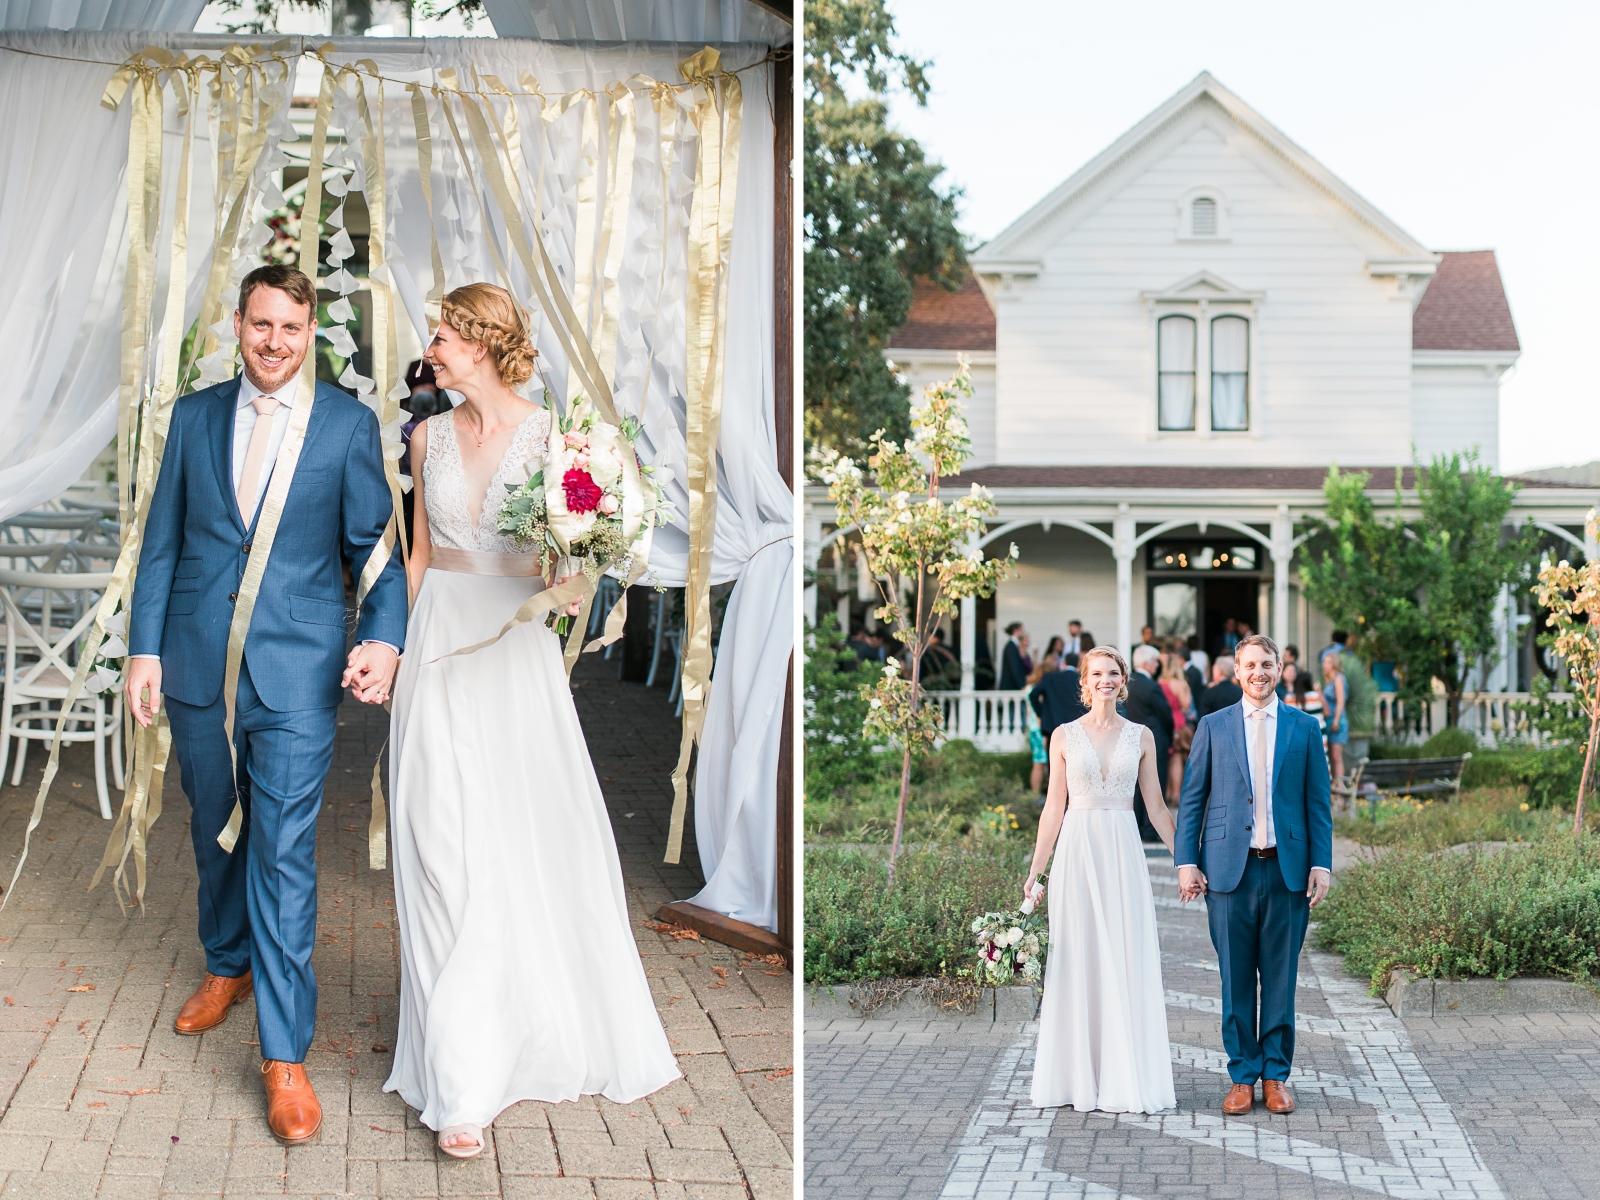 Generals Daughter Wedding Photos by JBJ Pictures - Ramekins Wedding Venue Photographer in Sonoma, Napa (28).jpg